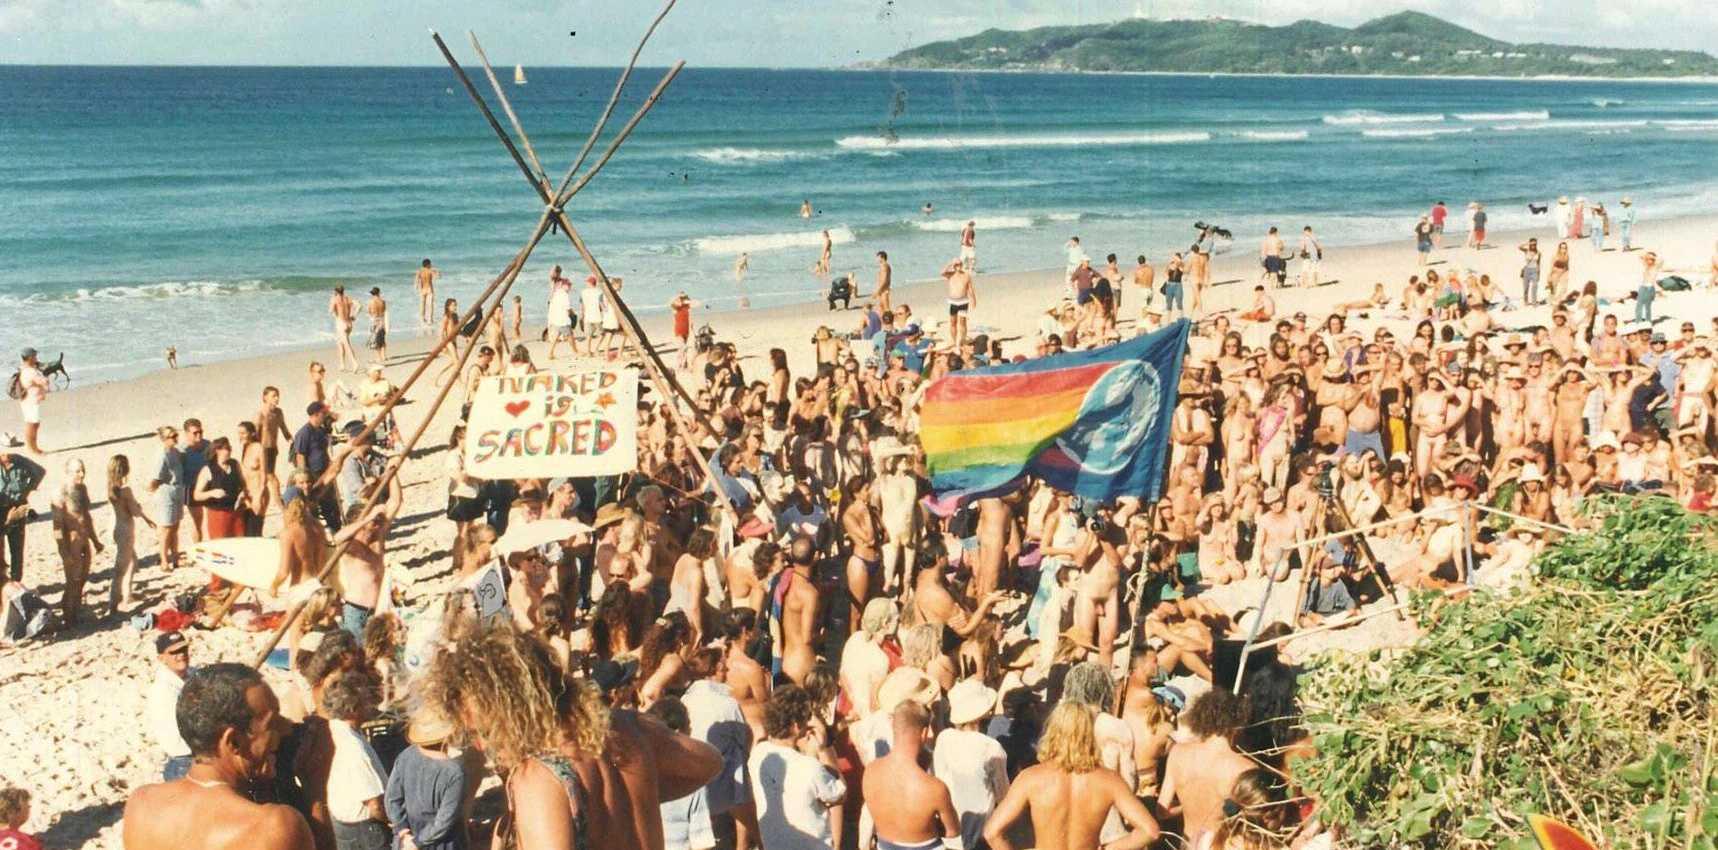 Getting it off. The Nude Ain't Rude rally on Belongil Beach. Photo Gary Chigwidden / Byron Shire News